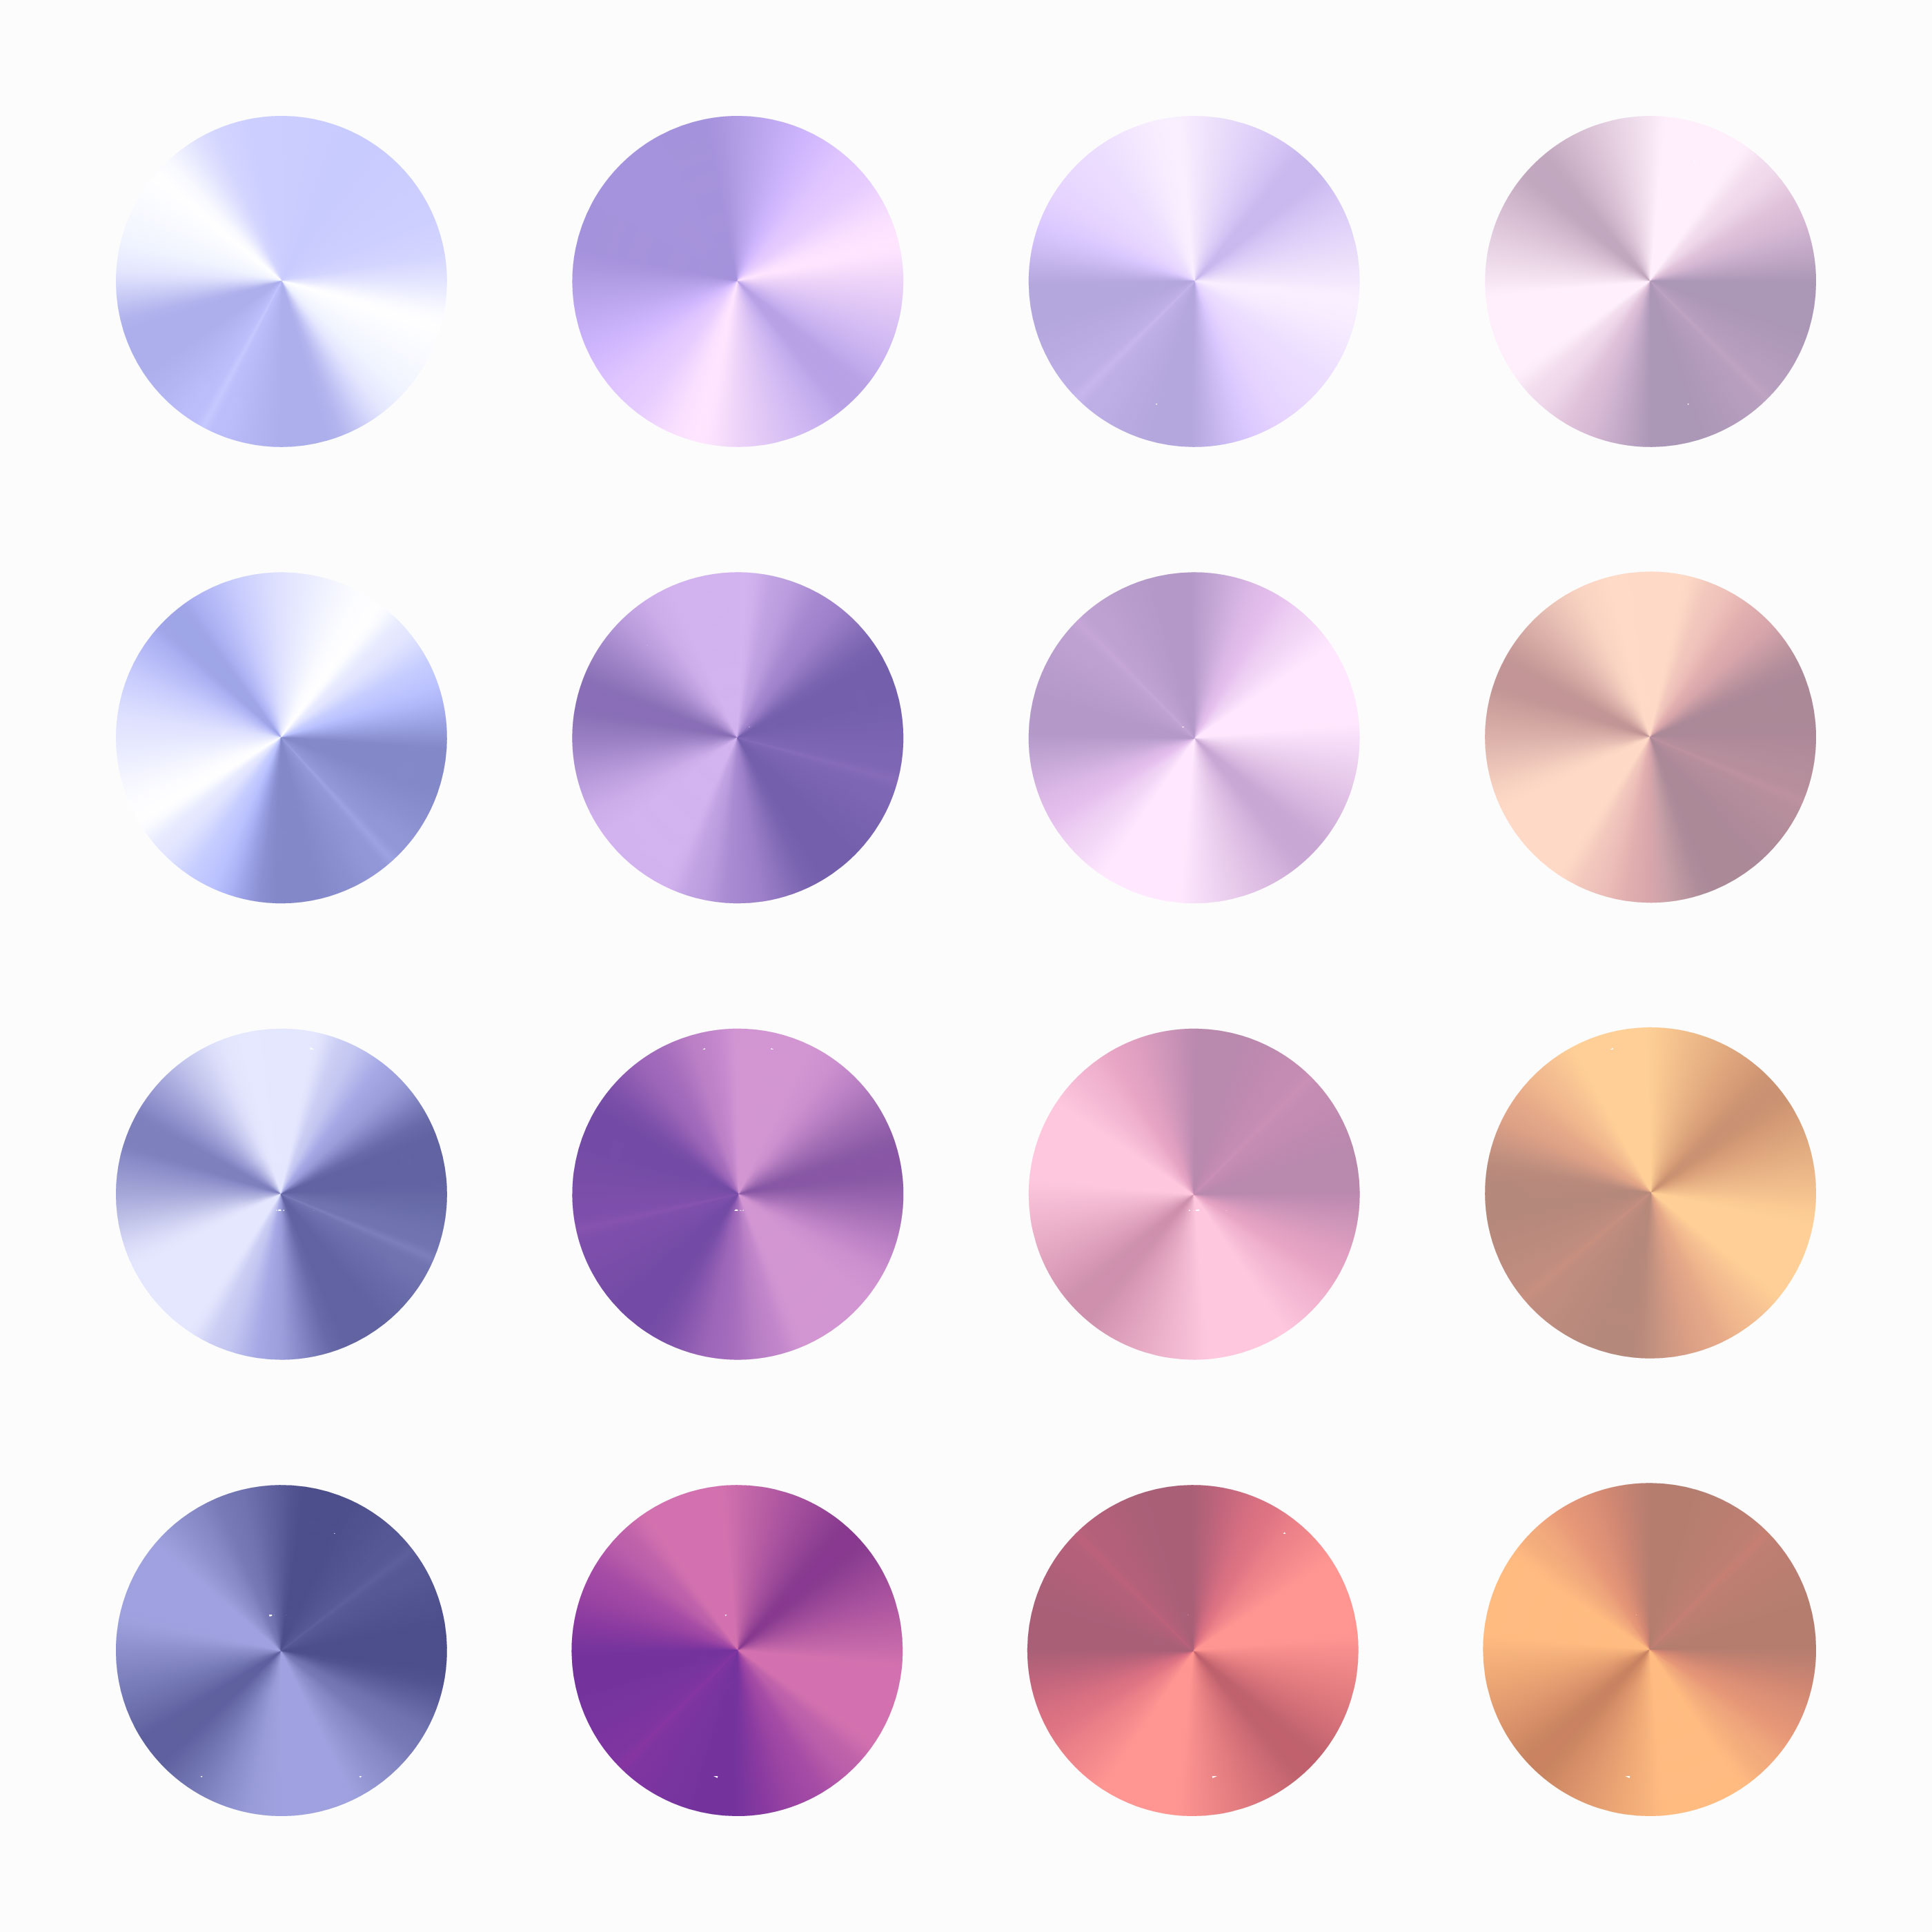 Soft Color Conical Gradient Vector Set